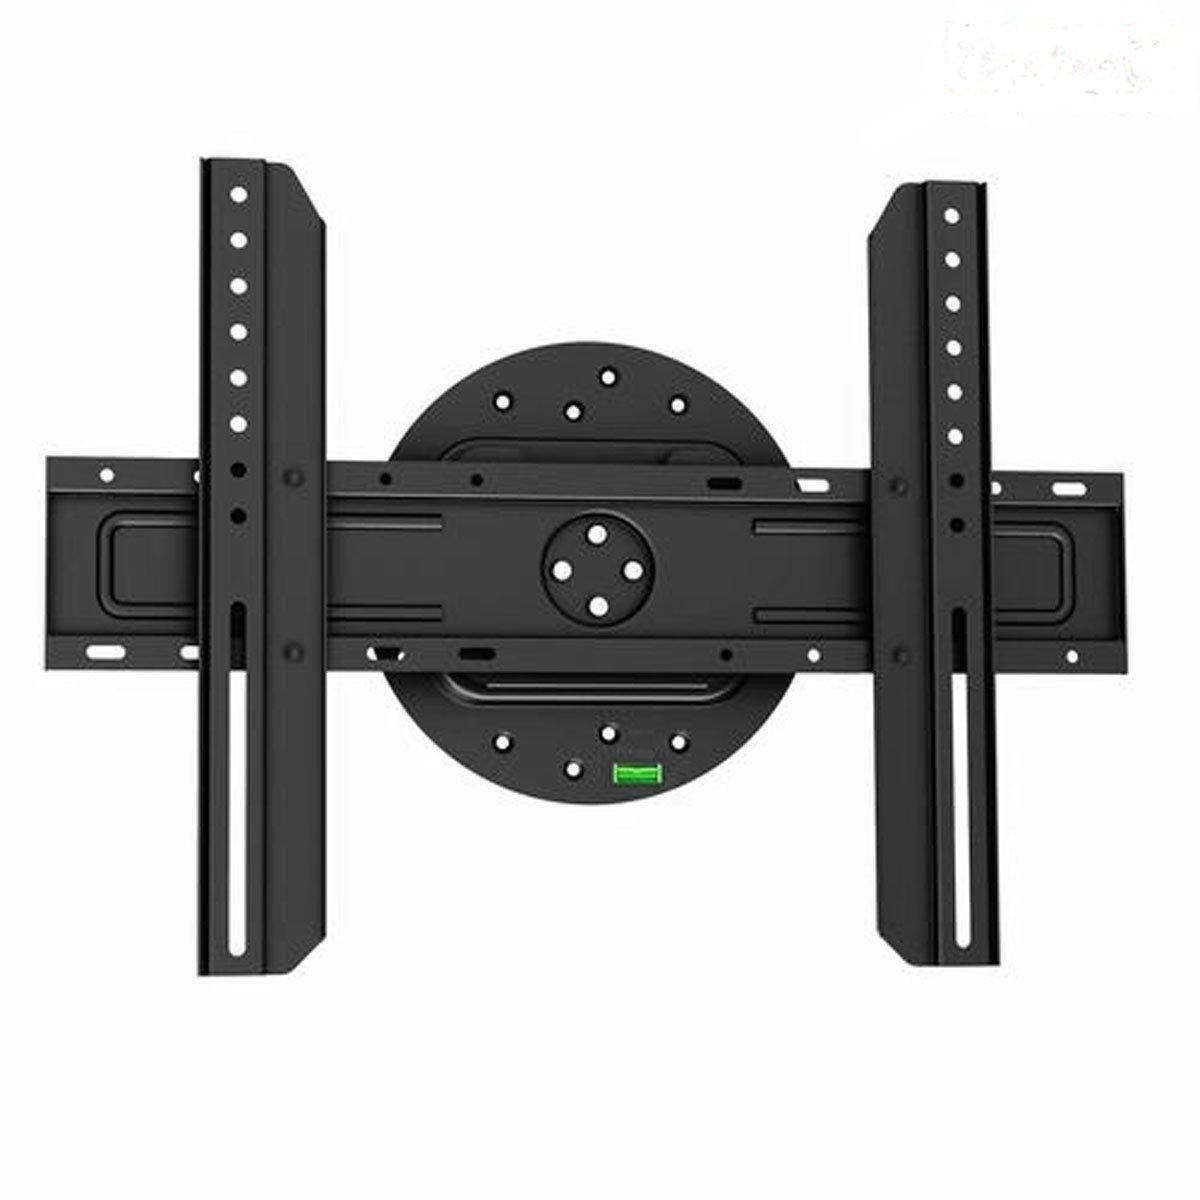 Black Full-Rotation Fixed/Flat Wall Mount Bracket for Vu Android TV LED55K160 55'' inch LED HDTV TV/Television - Fixed/Flat/Rotating